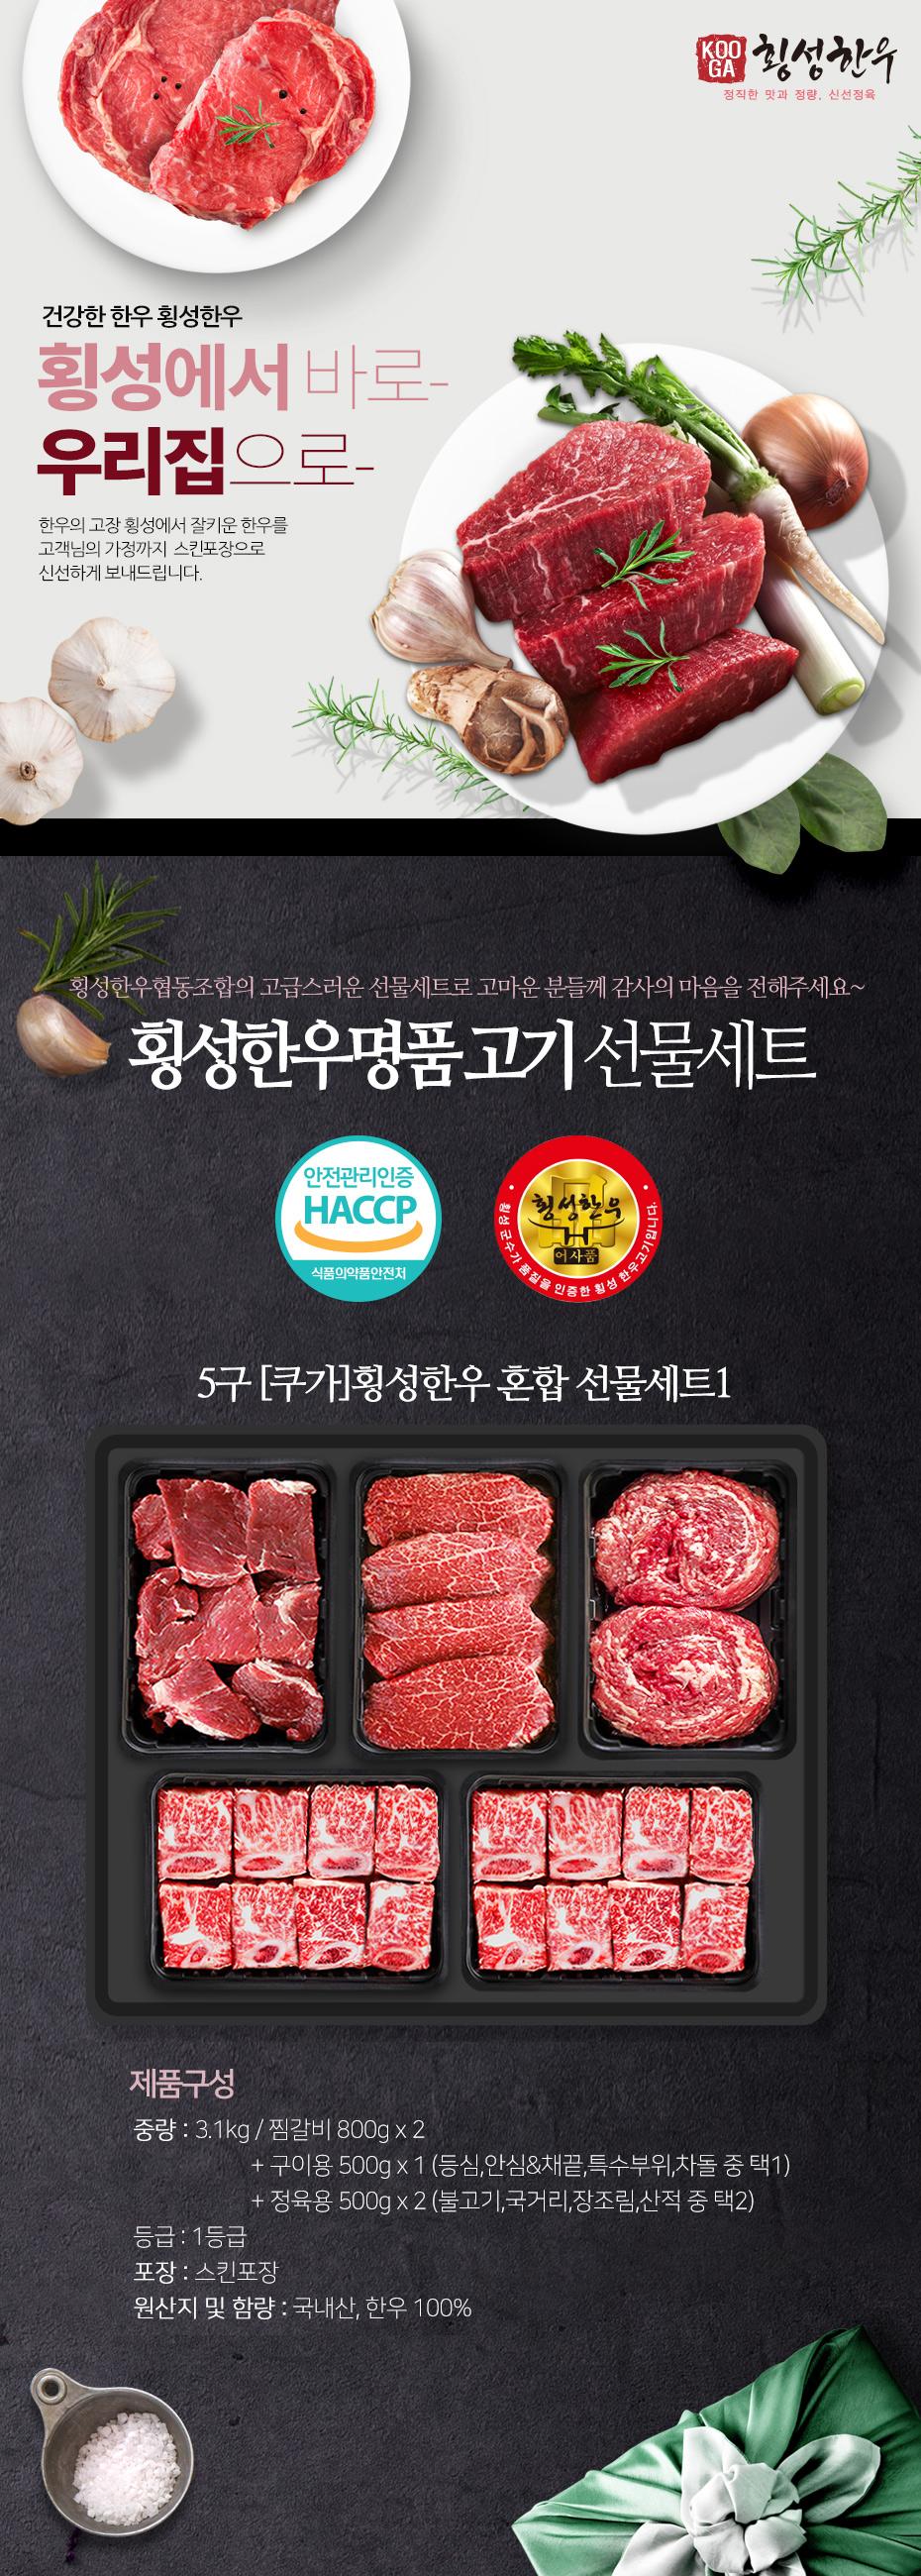 set5_meat_rib2_s2_ten_222222.jpg